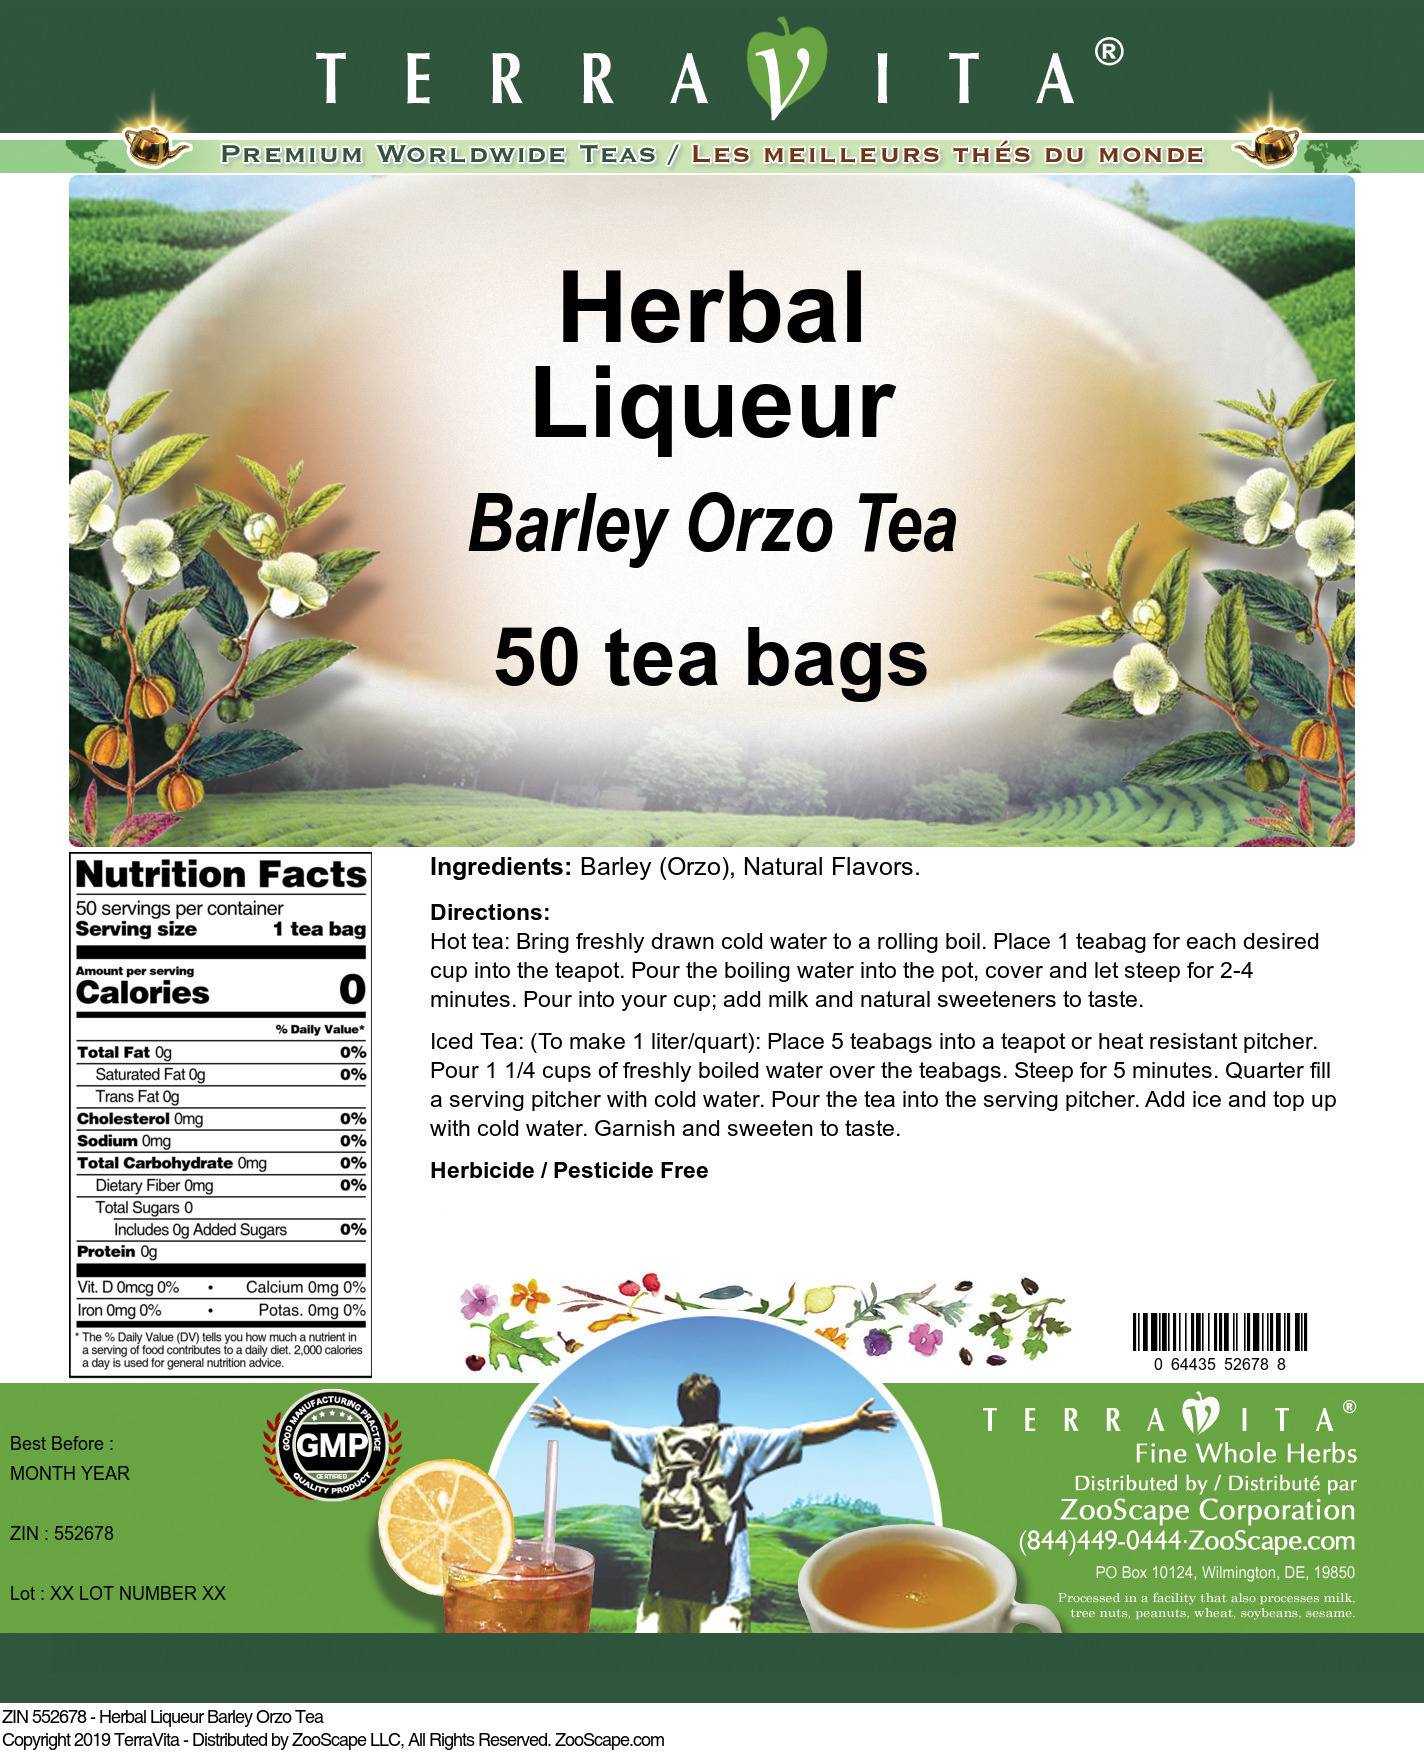 Herbal Liqueur Barley Orzo Tea